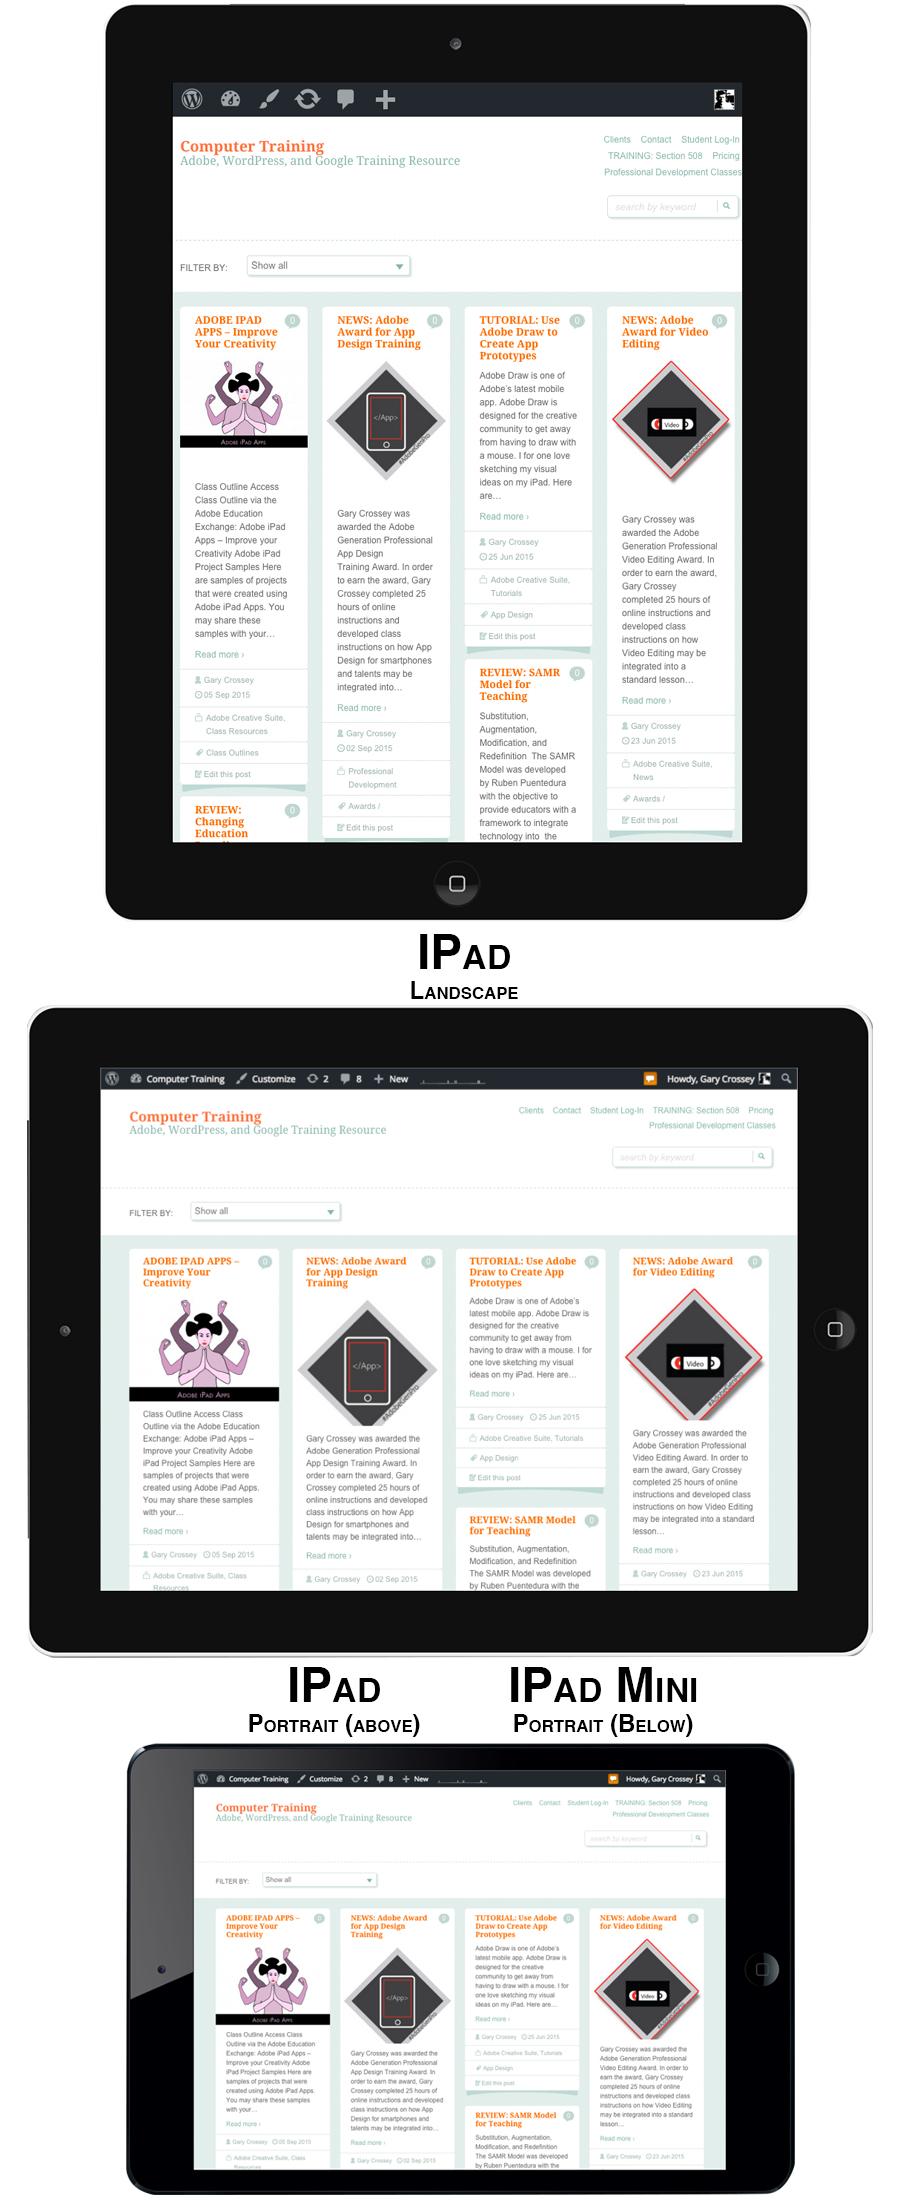 Website Design for Smartphone Users